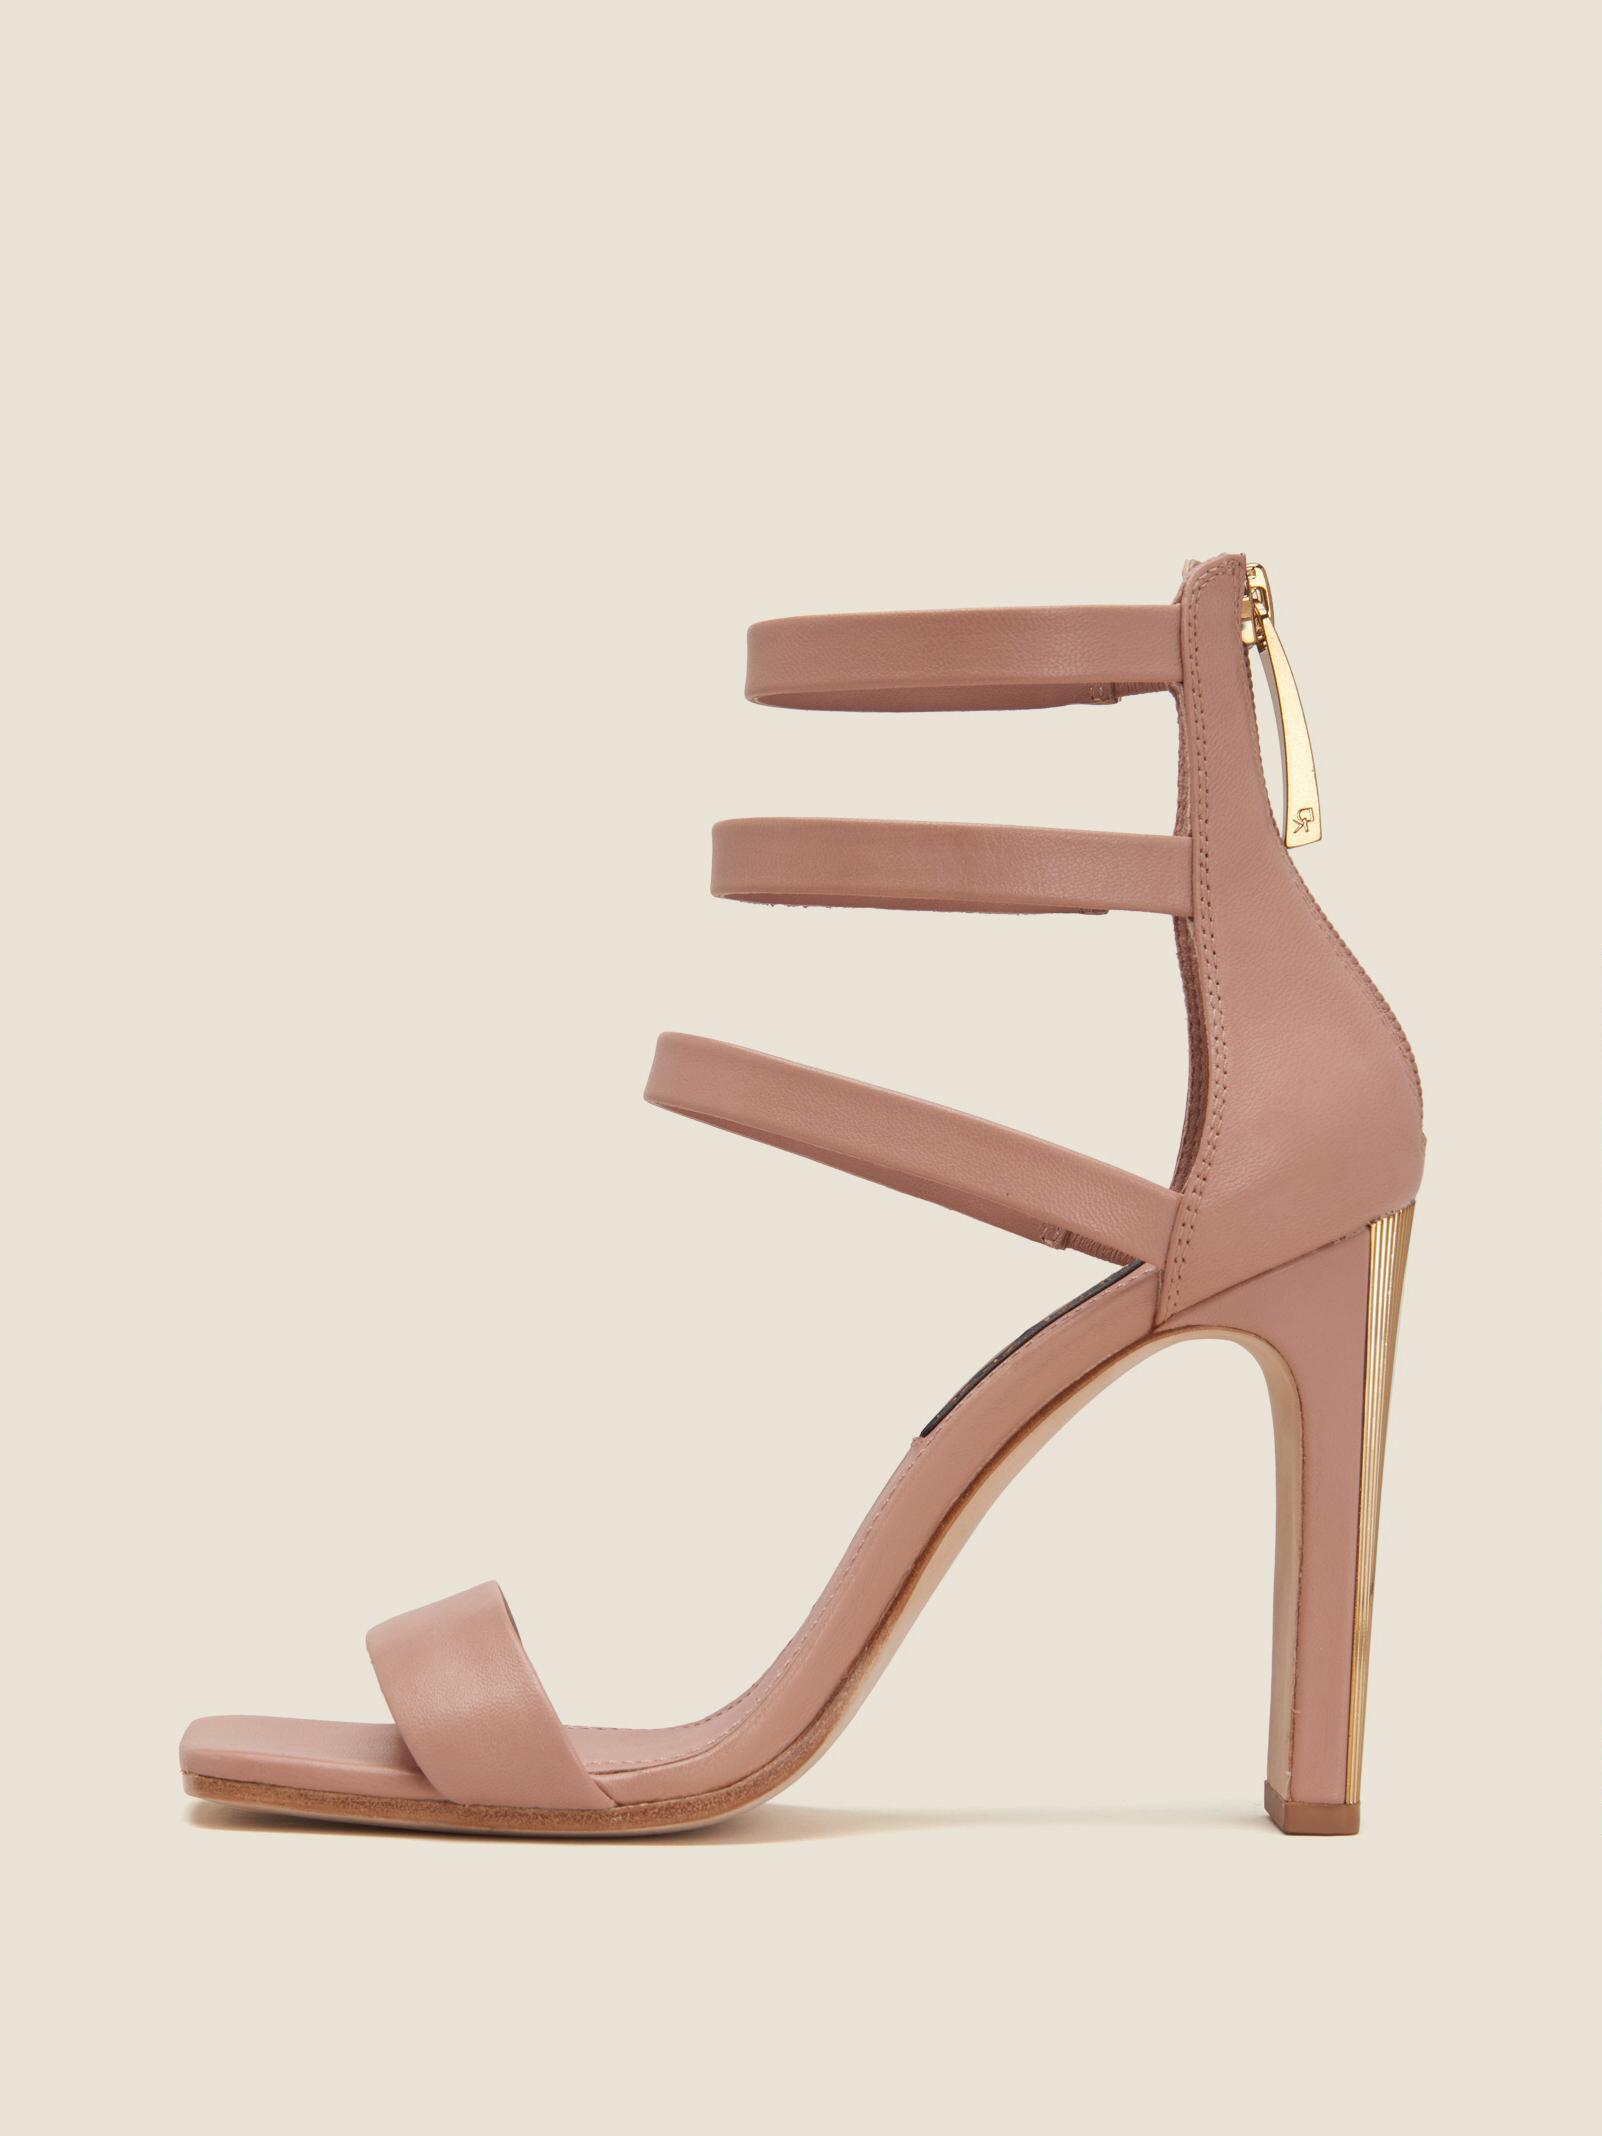 93432d9c7fb Women's Pink Sol Leather Ankle Strap Sandal